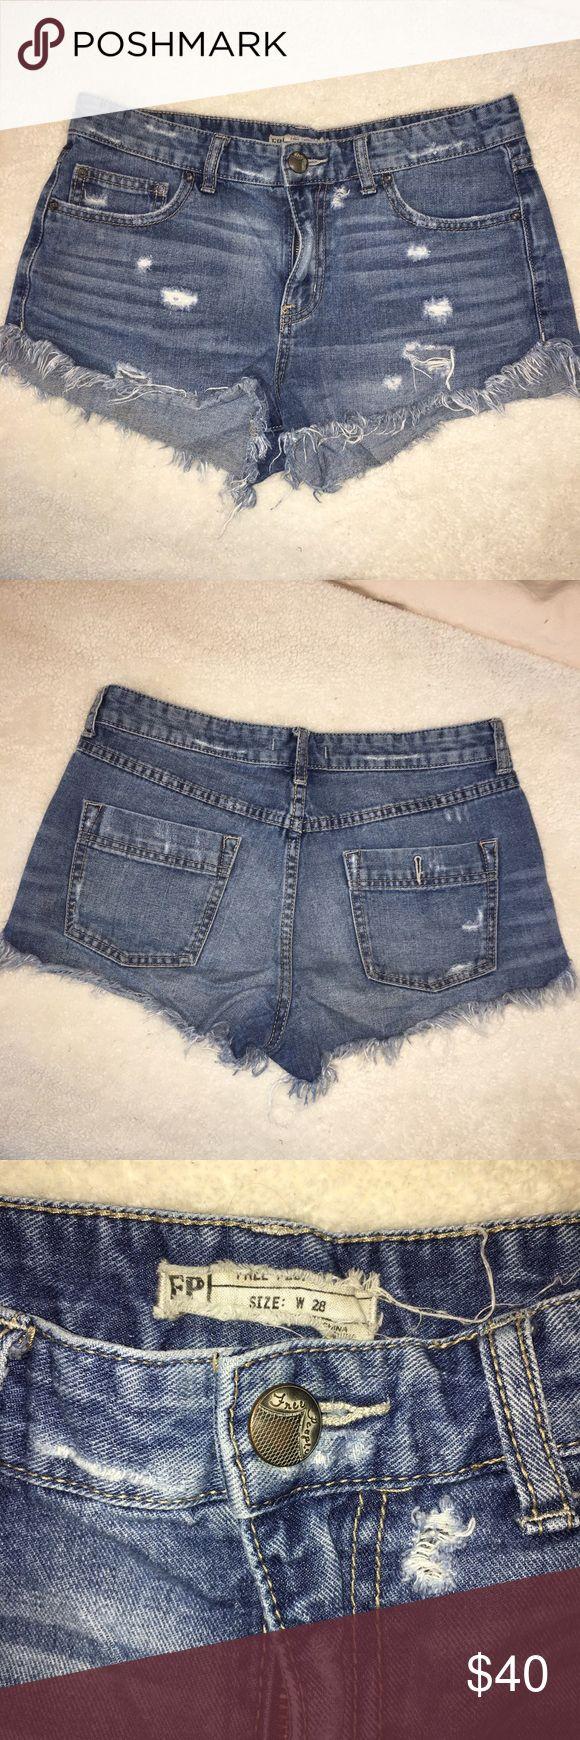 Free People Cutoff Jean Shorts Distressed denim cutoff jean shorts from Free People. Only worn a couple of times. Make offers! Free People Shorts Jean Shorts